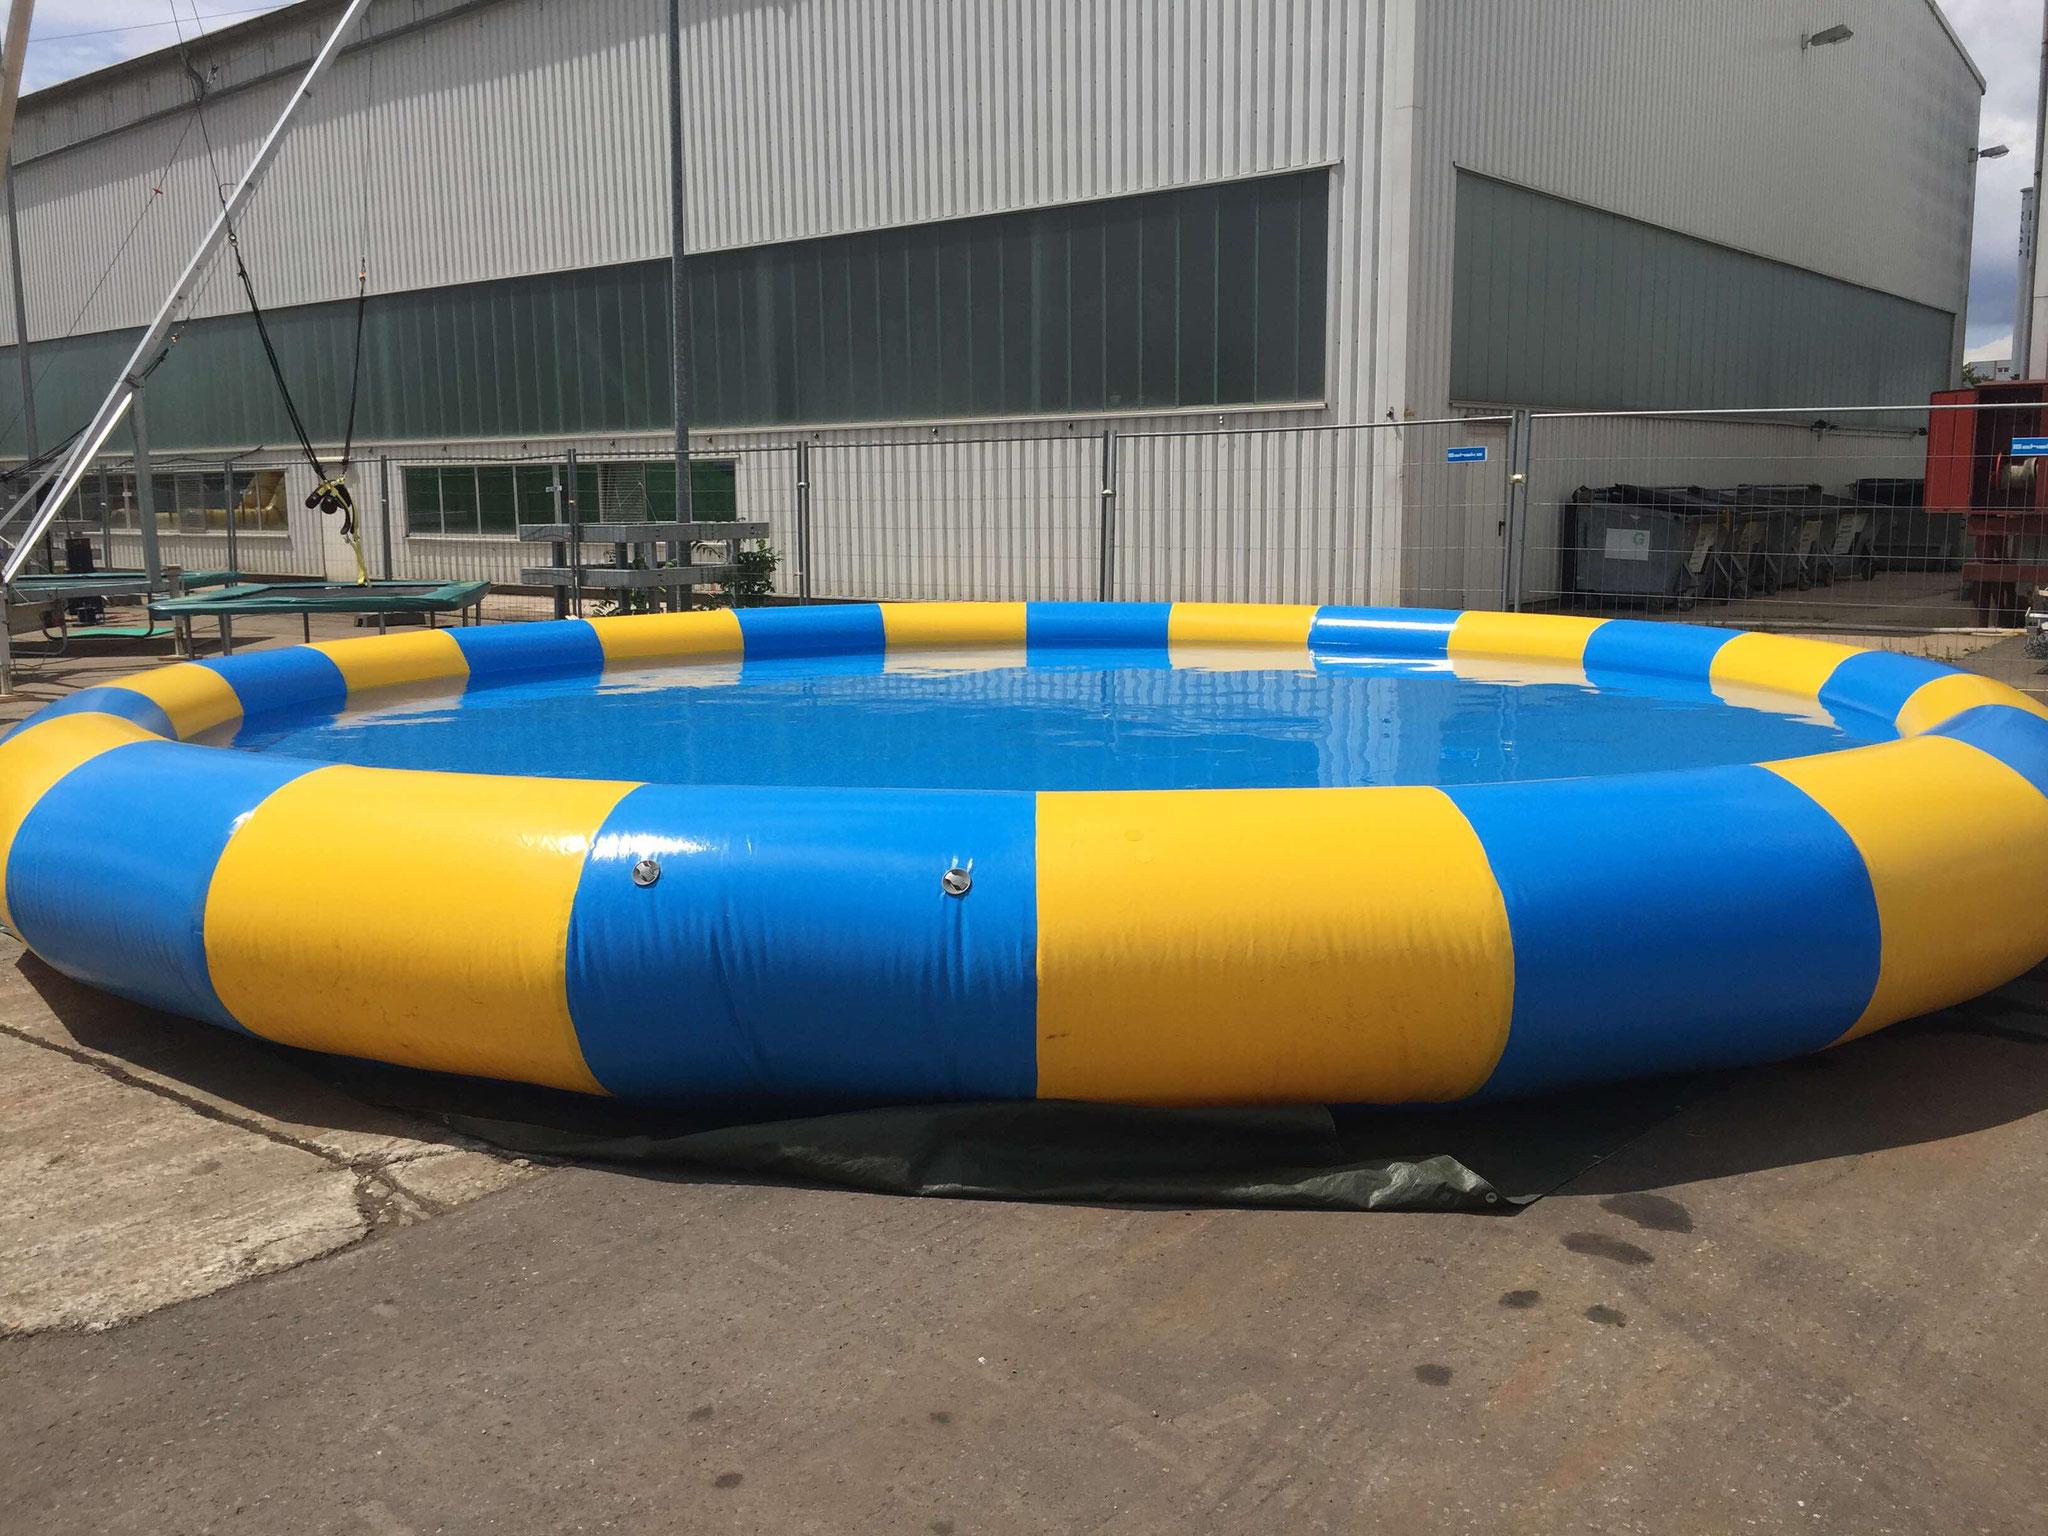 8 Meter Pool, Durchmesser 8x2,5 Meter